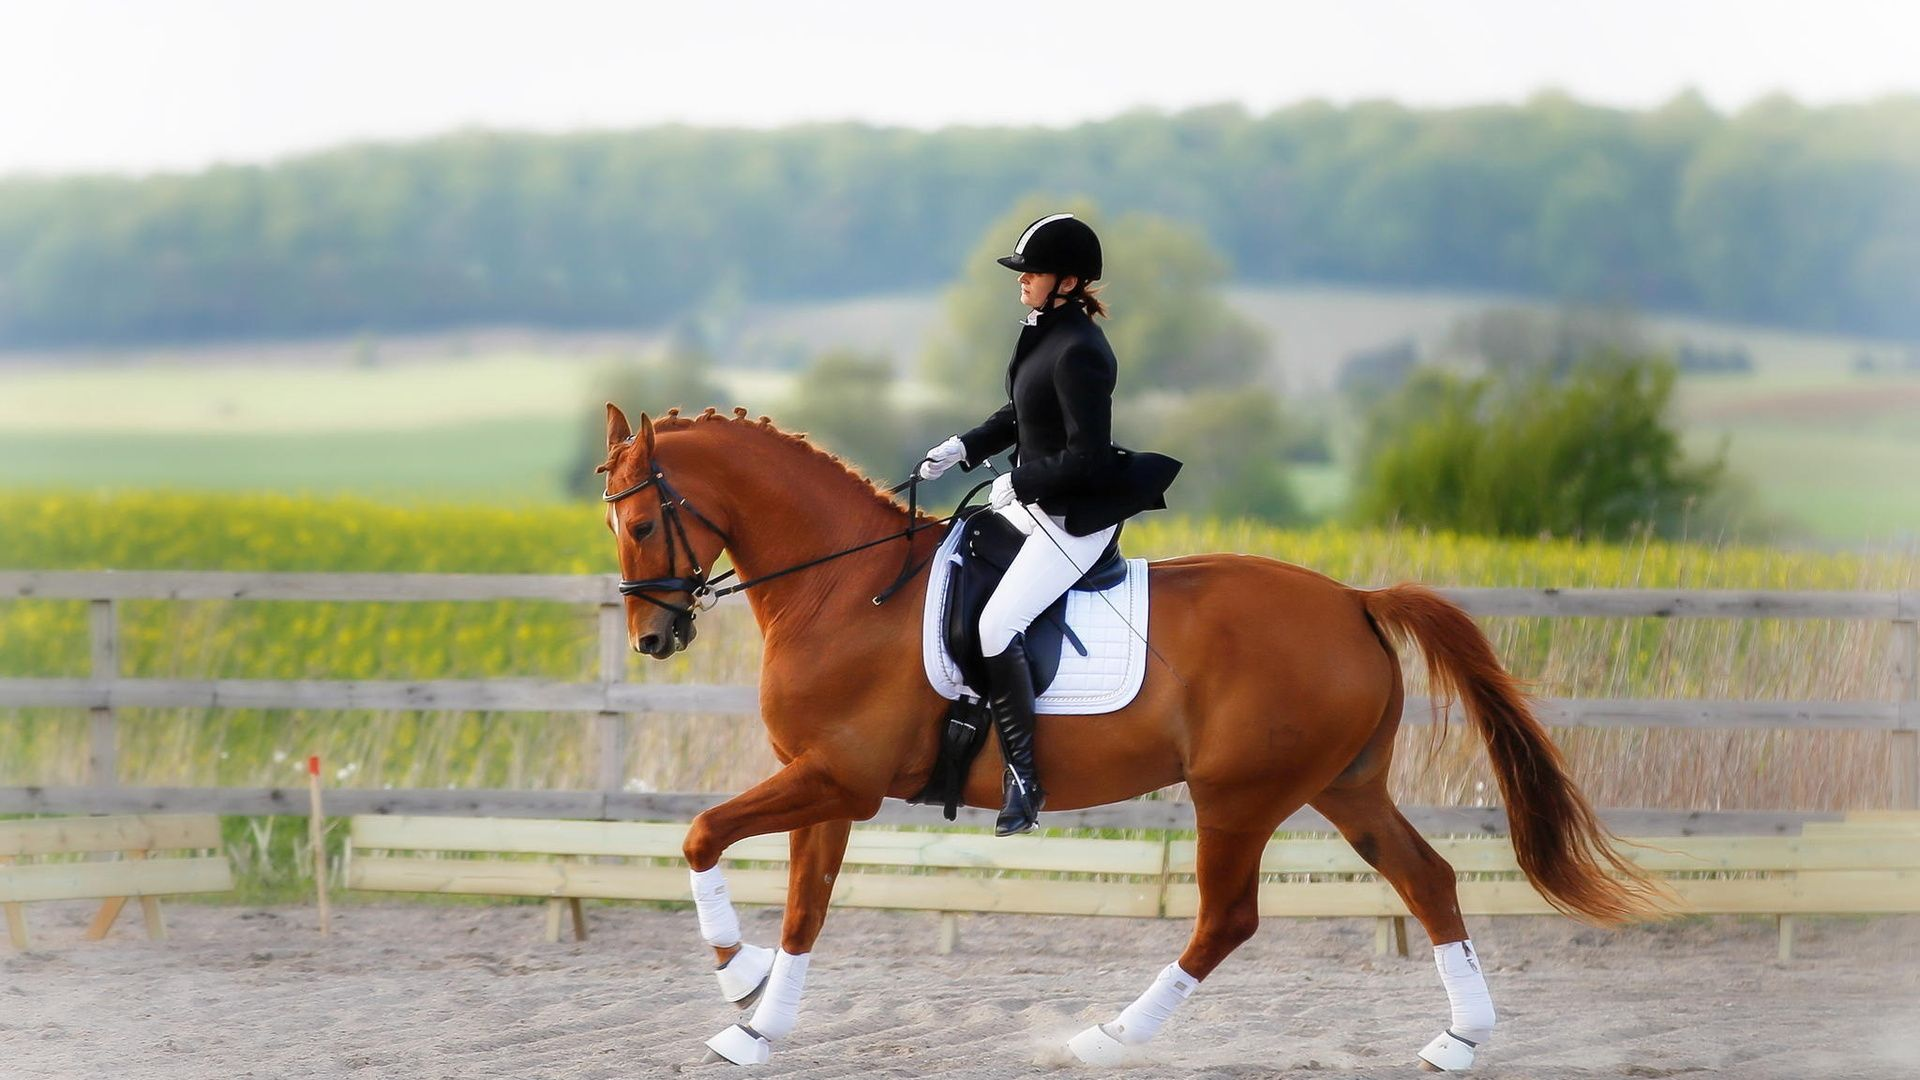 Equestrian wallpaper photo hd